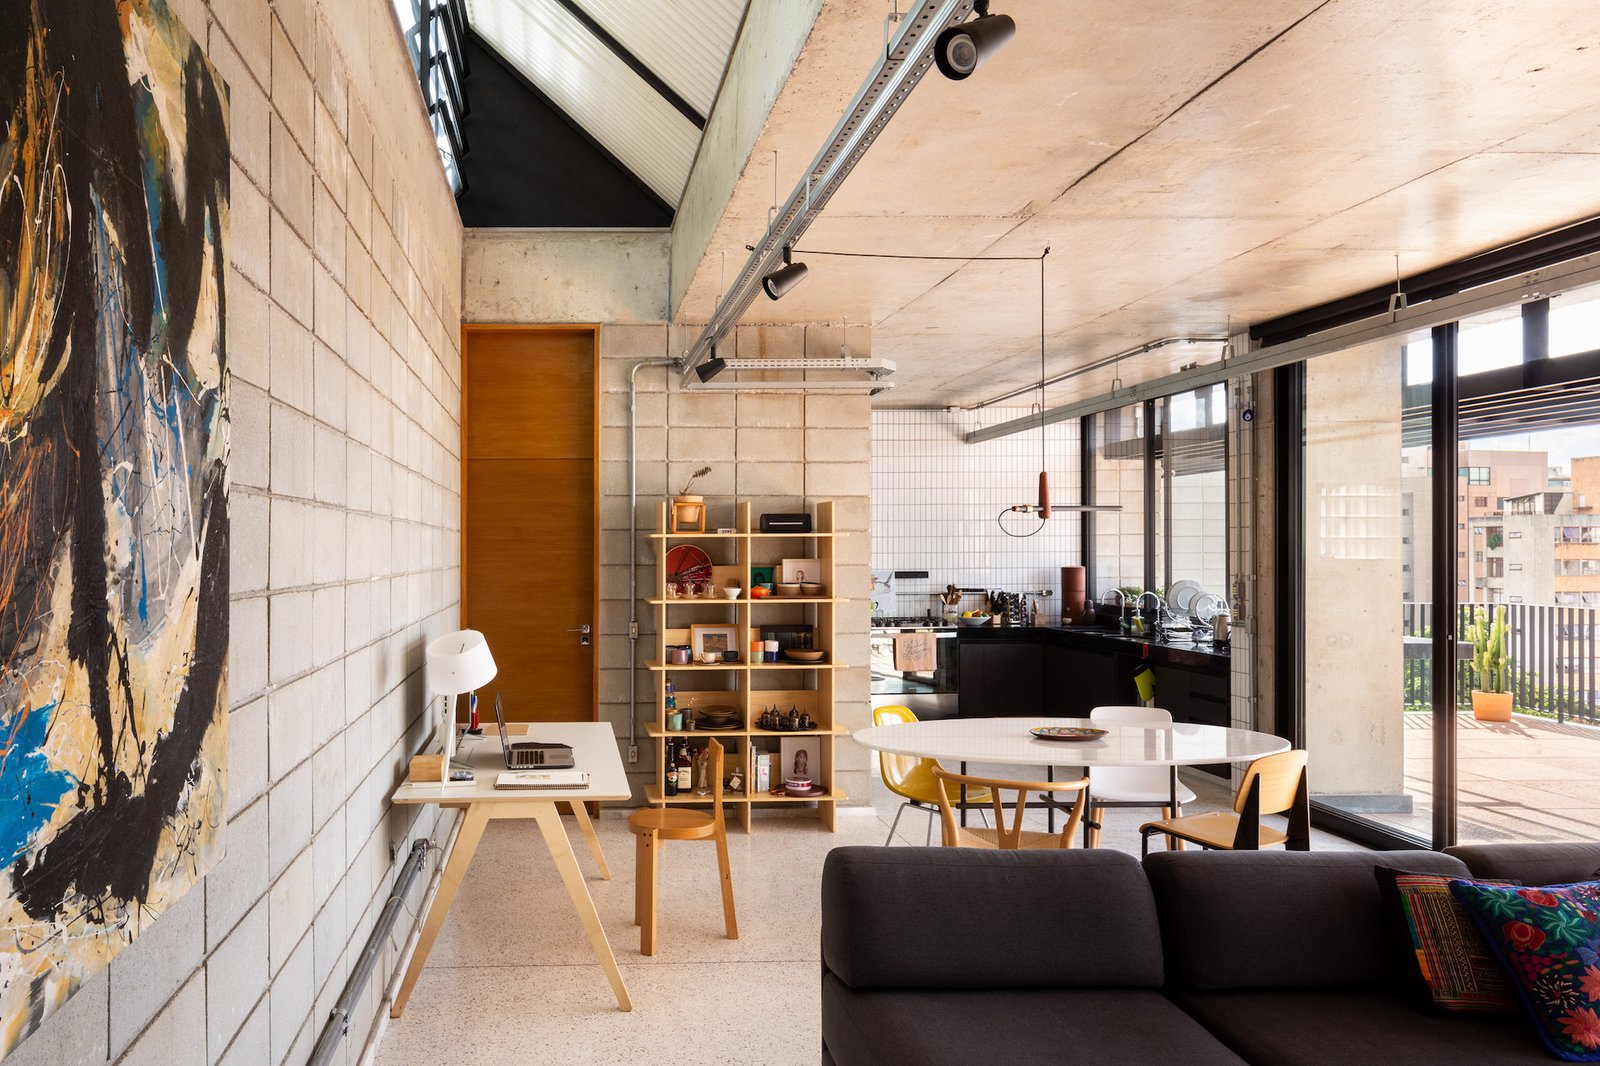 Casa Comiteco by Marcos Franchini and Nattalia Bom Conselho living room